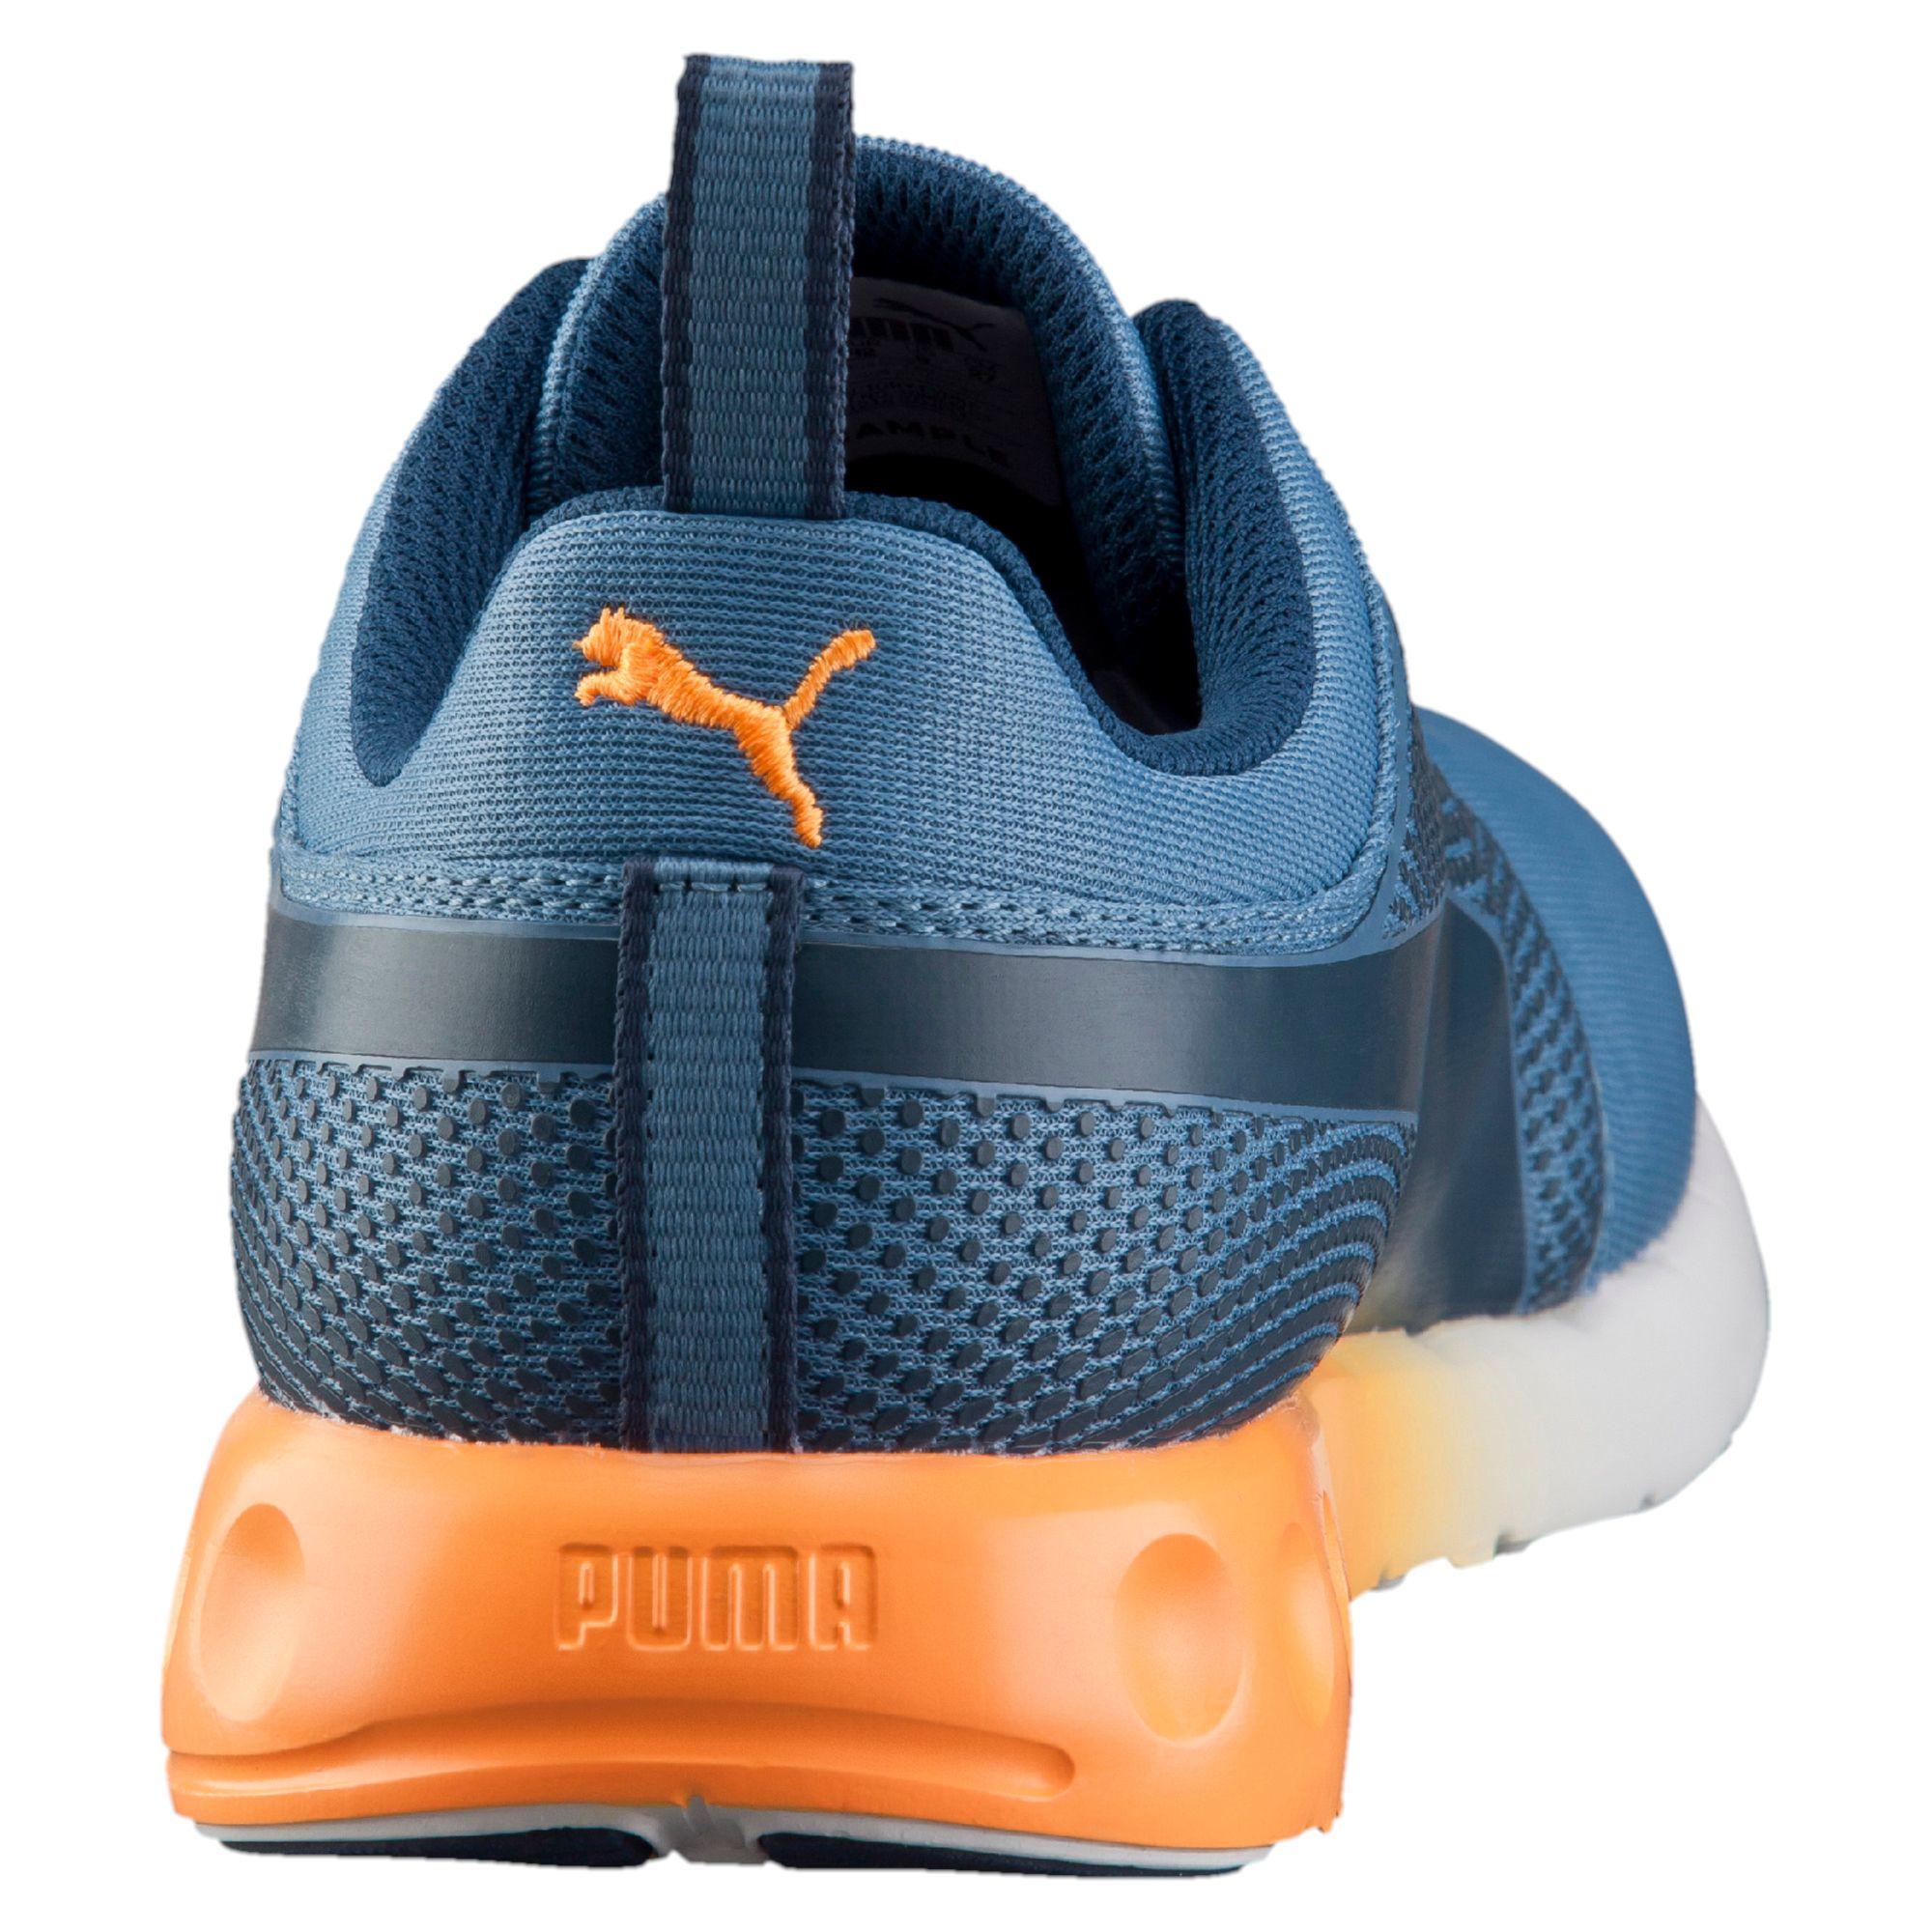 8425700ab3bf Lyst - PUMA Carson Runner Inno Men s Running Shoes in Orange for Men